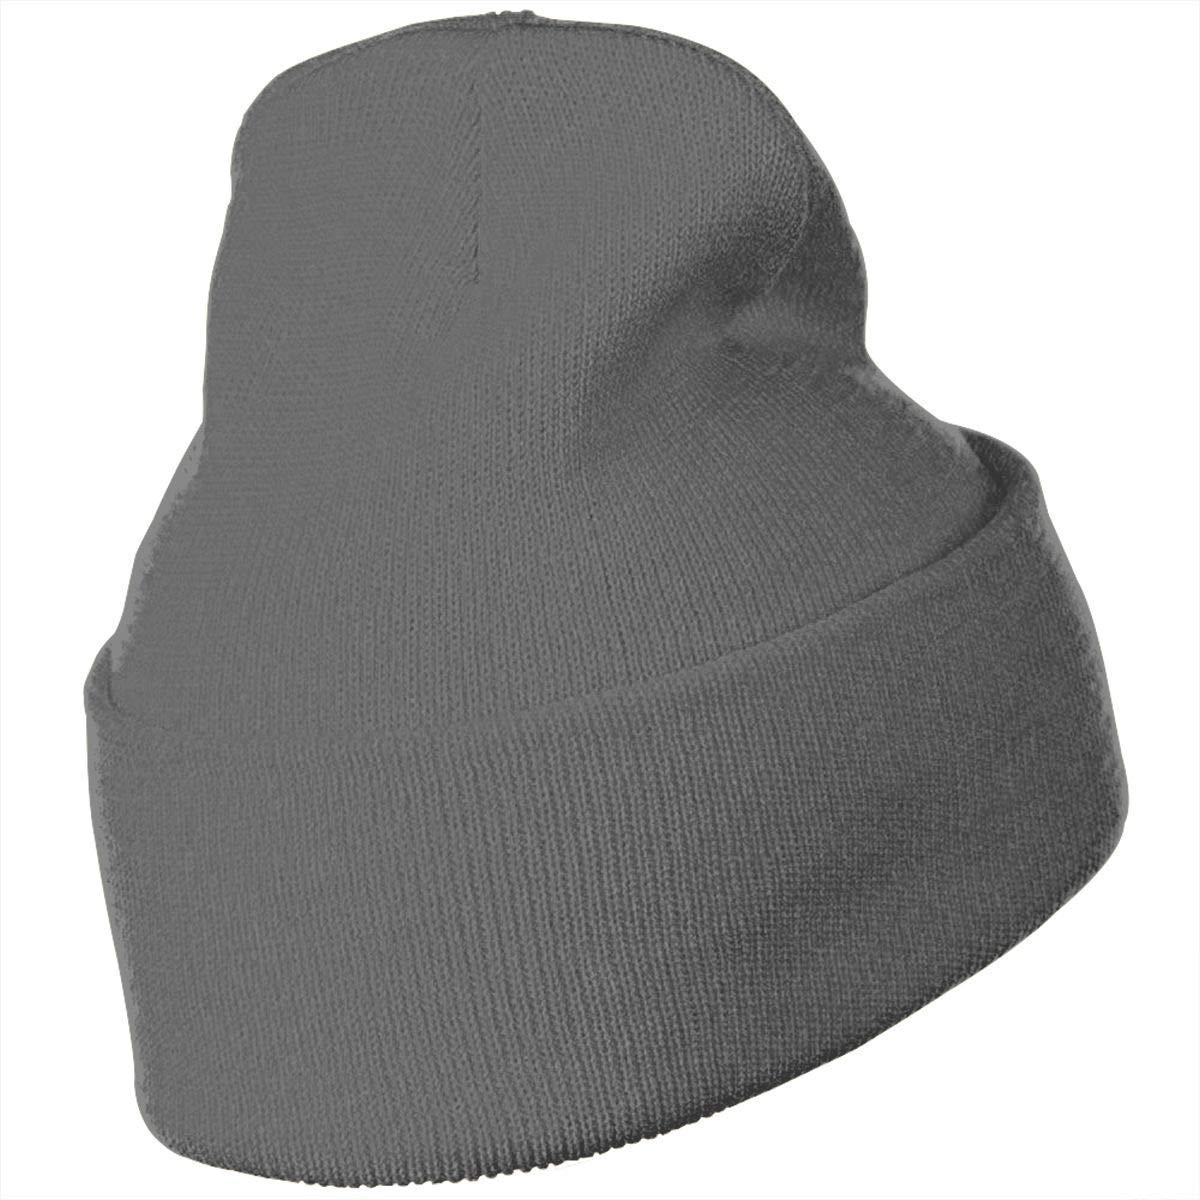 Cat Black Warm Knit Winter Solid Beanie Hat Unisex Skull Cap